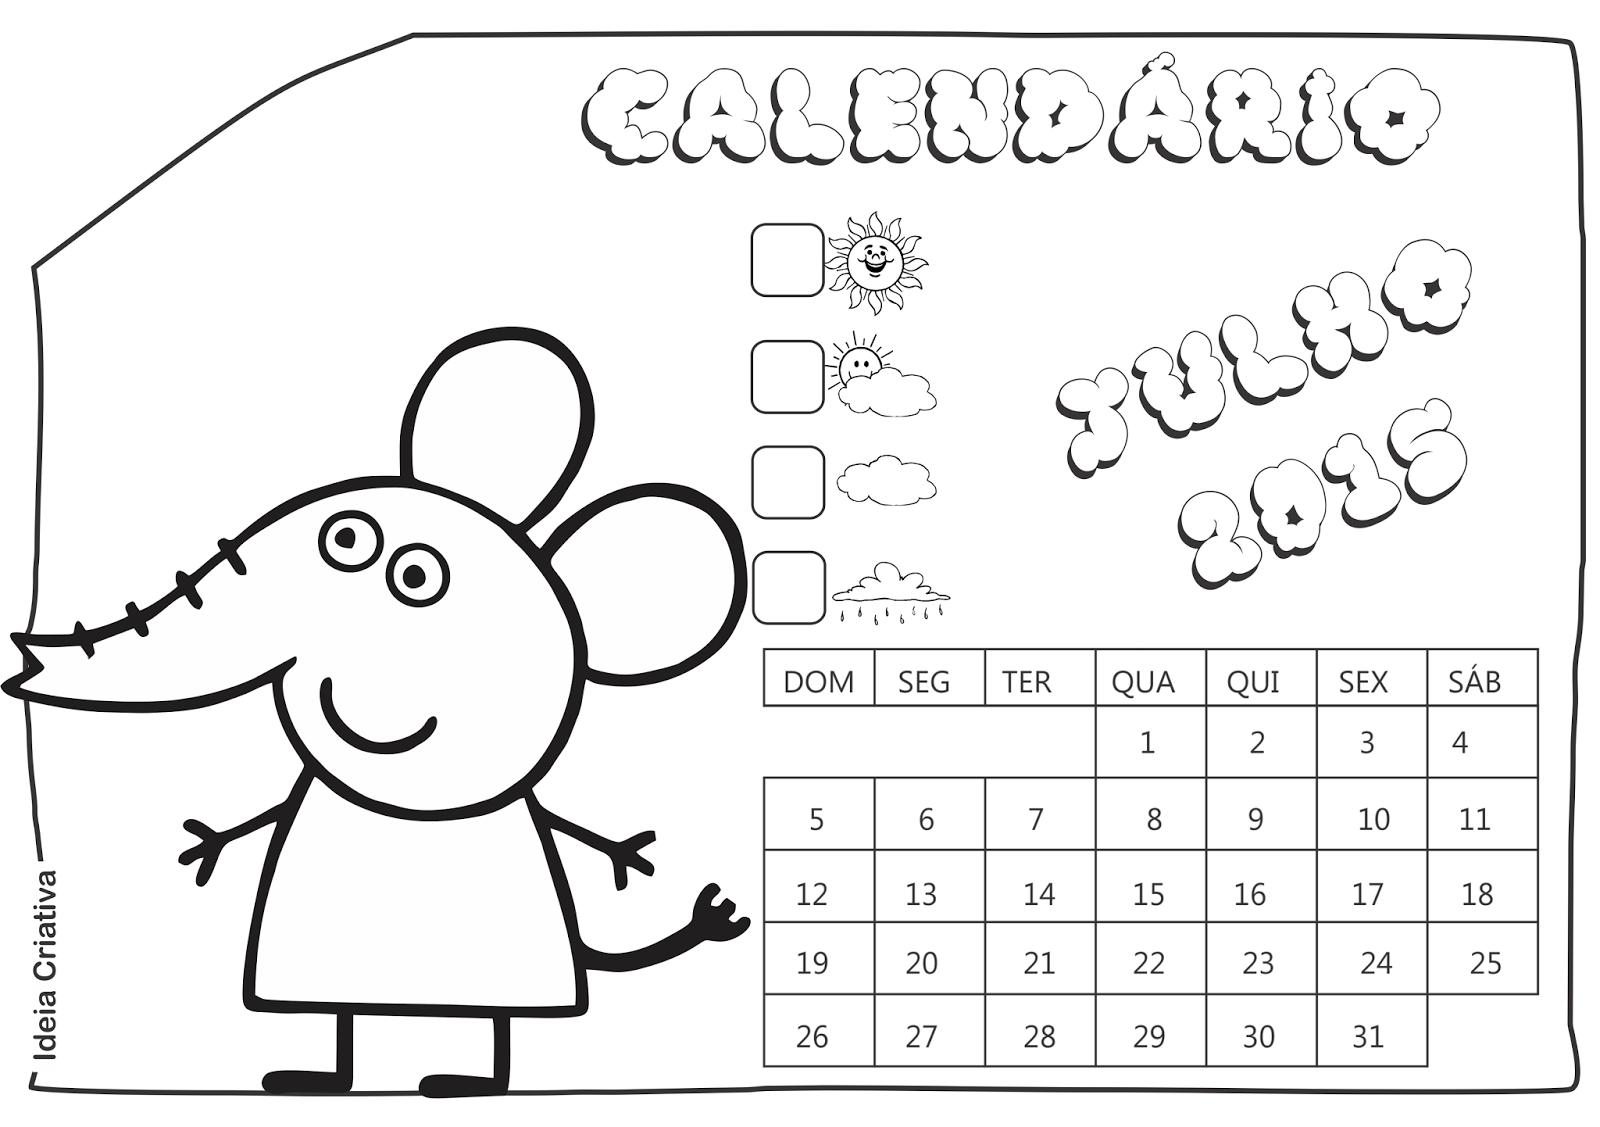 Pravoalavni Uskrs 2016 | New Calendar Template Site